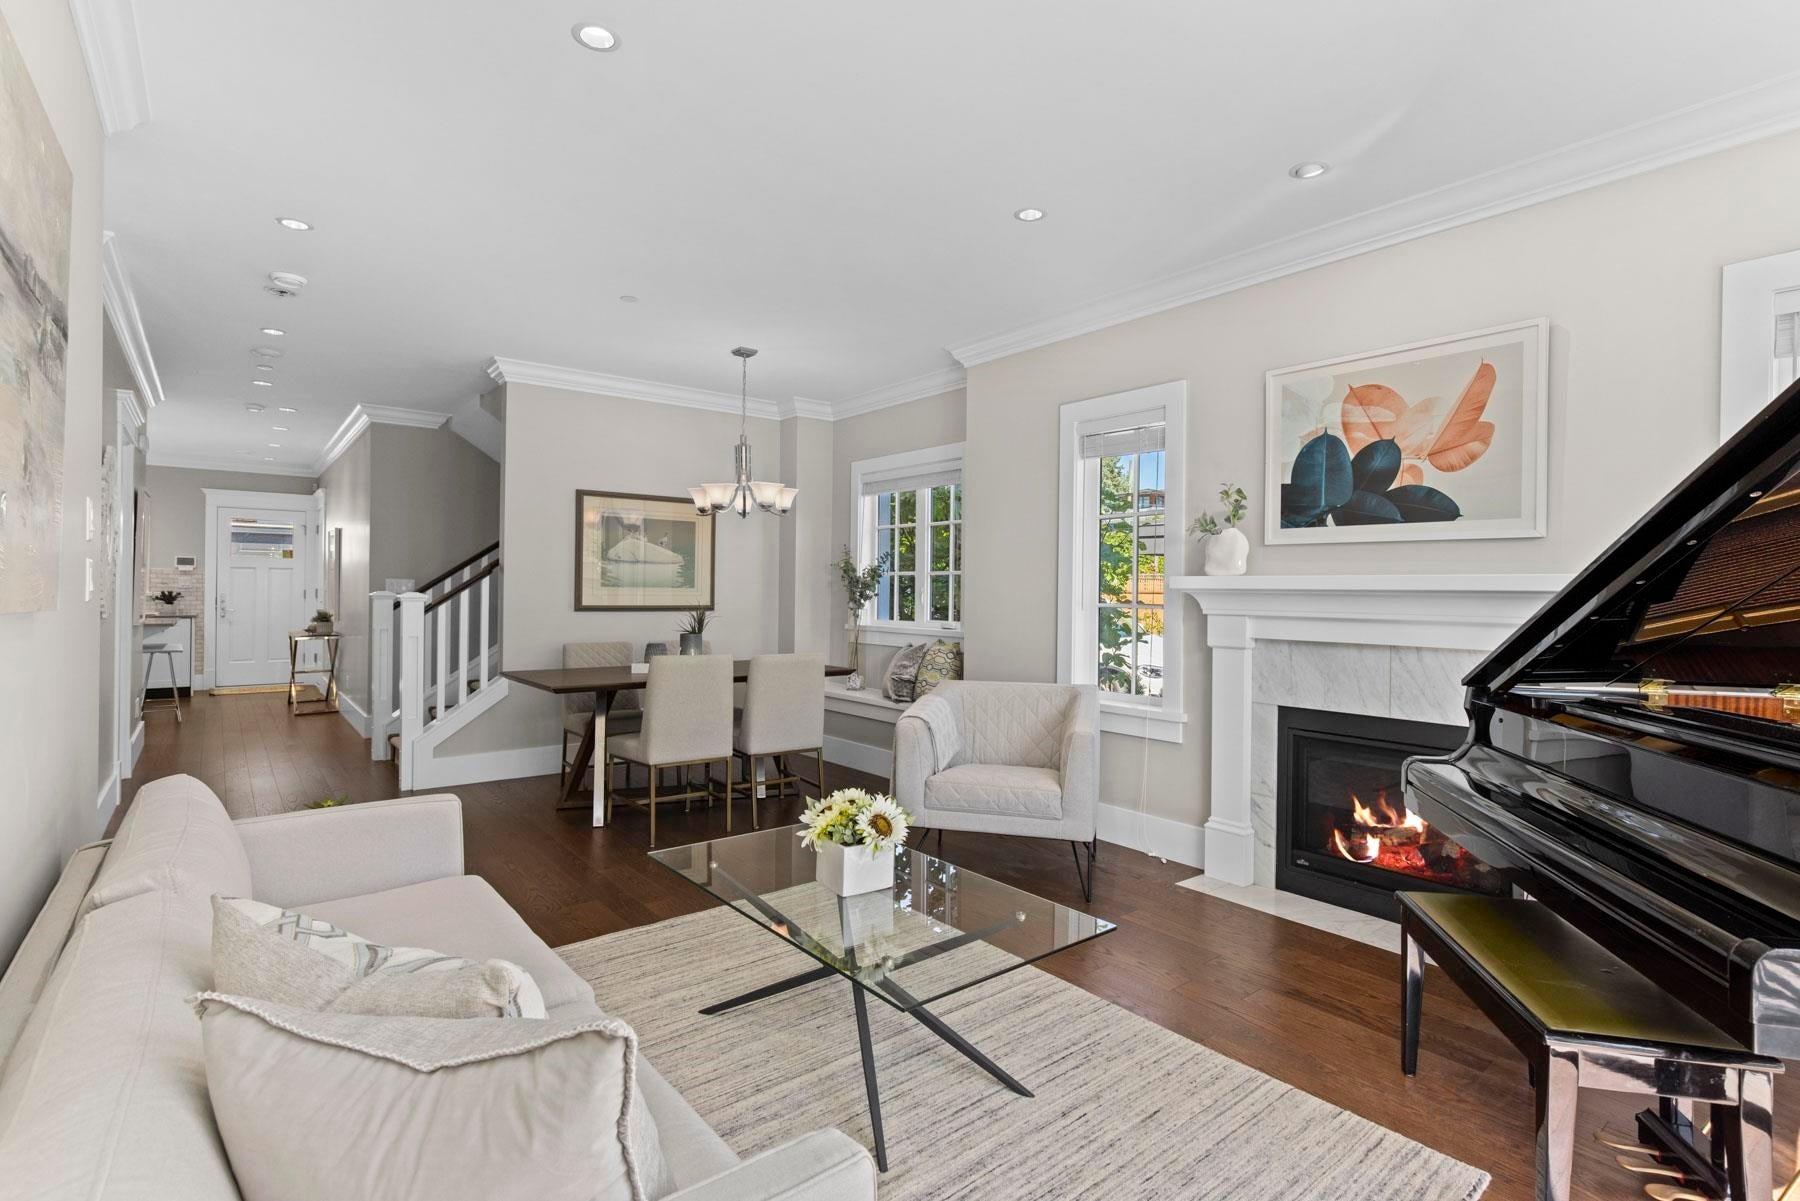 1421 GORDON AVENUE - Ambleside House/Single Family for sale, 3 Bedrooms (R2617756) - #4